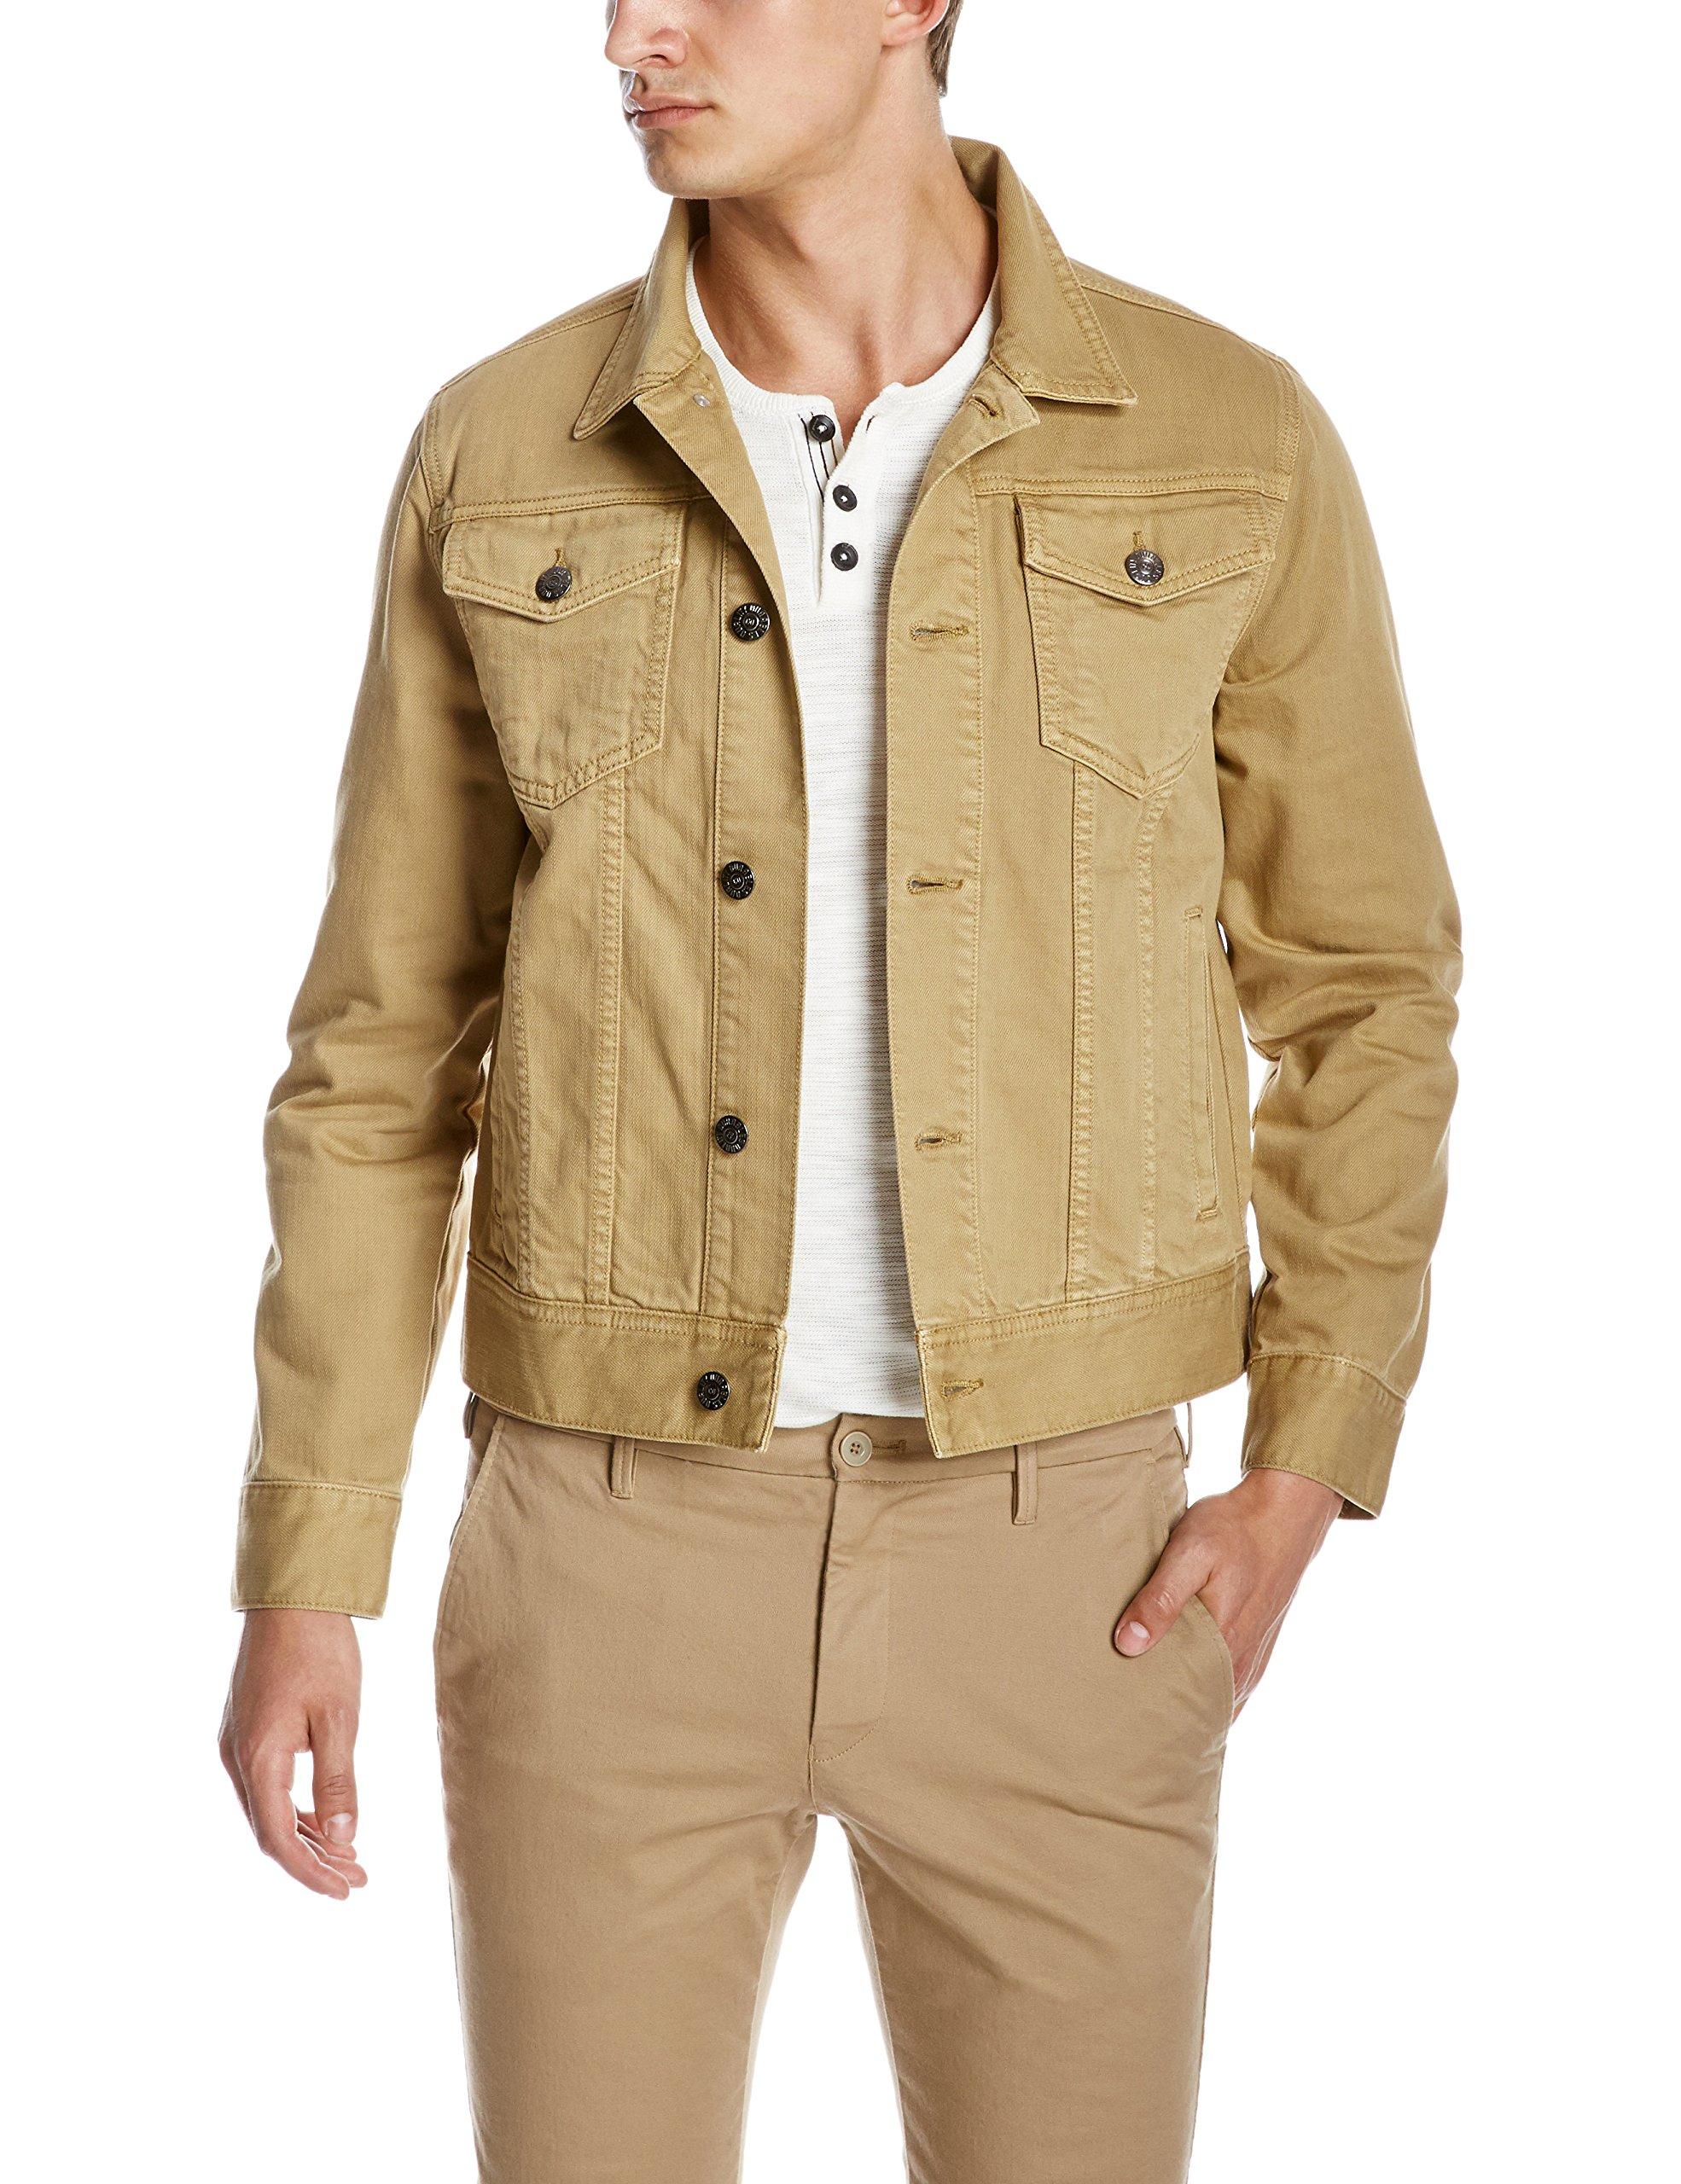 Quality Durables Co. Men's Regular-Fit Jean Jacket S Khaki by Quality Durables Co.